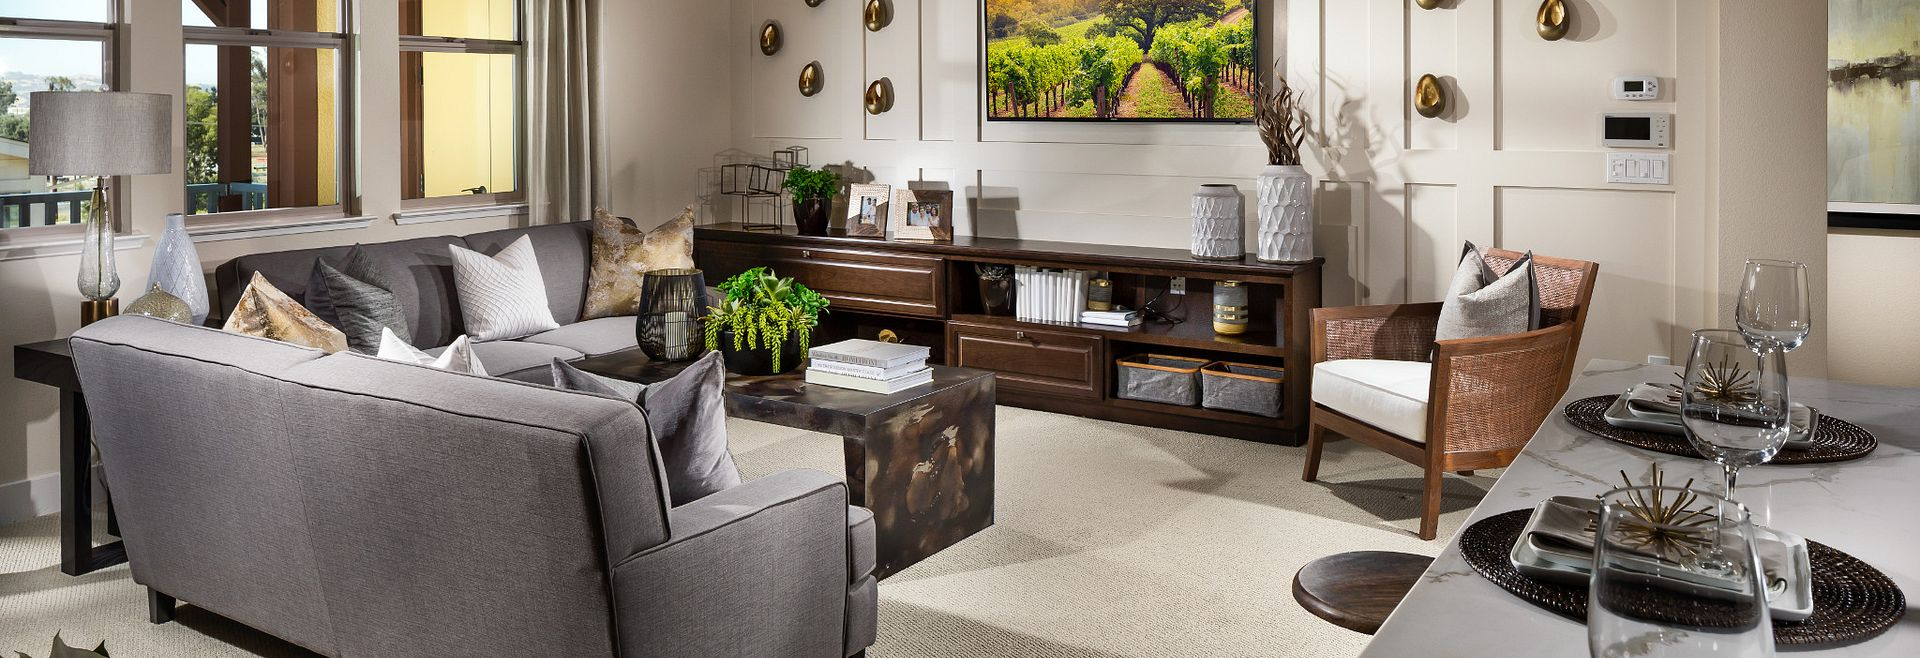 Harmony Sage Plan 4 Livermore Living Room